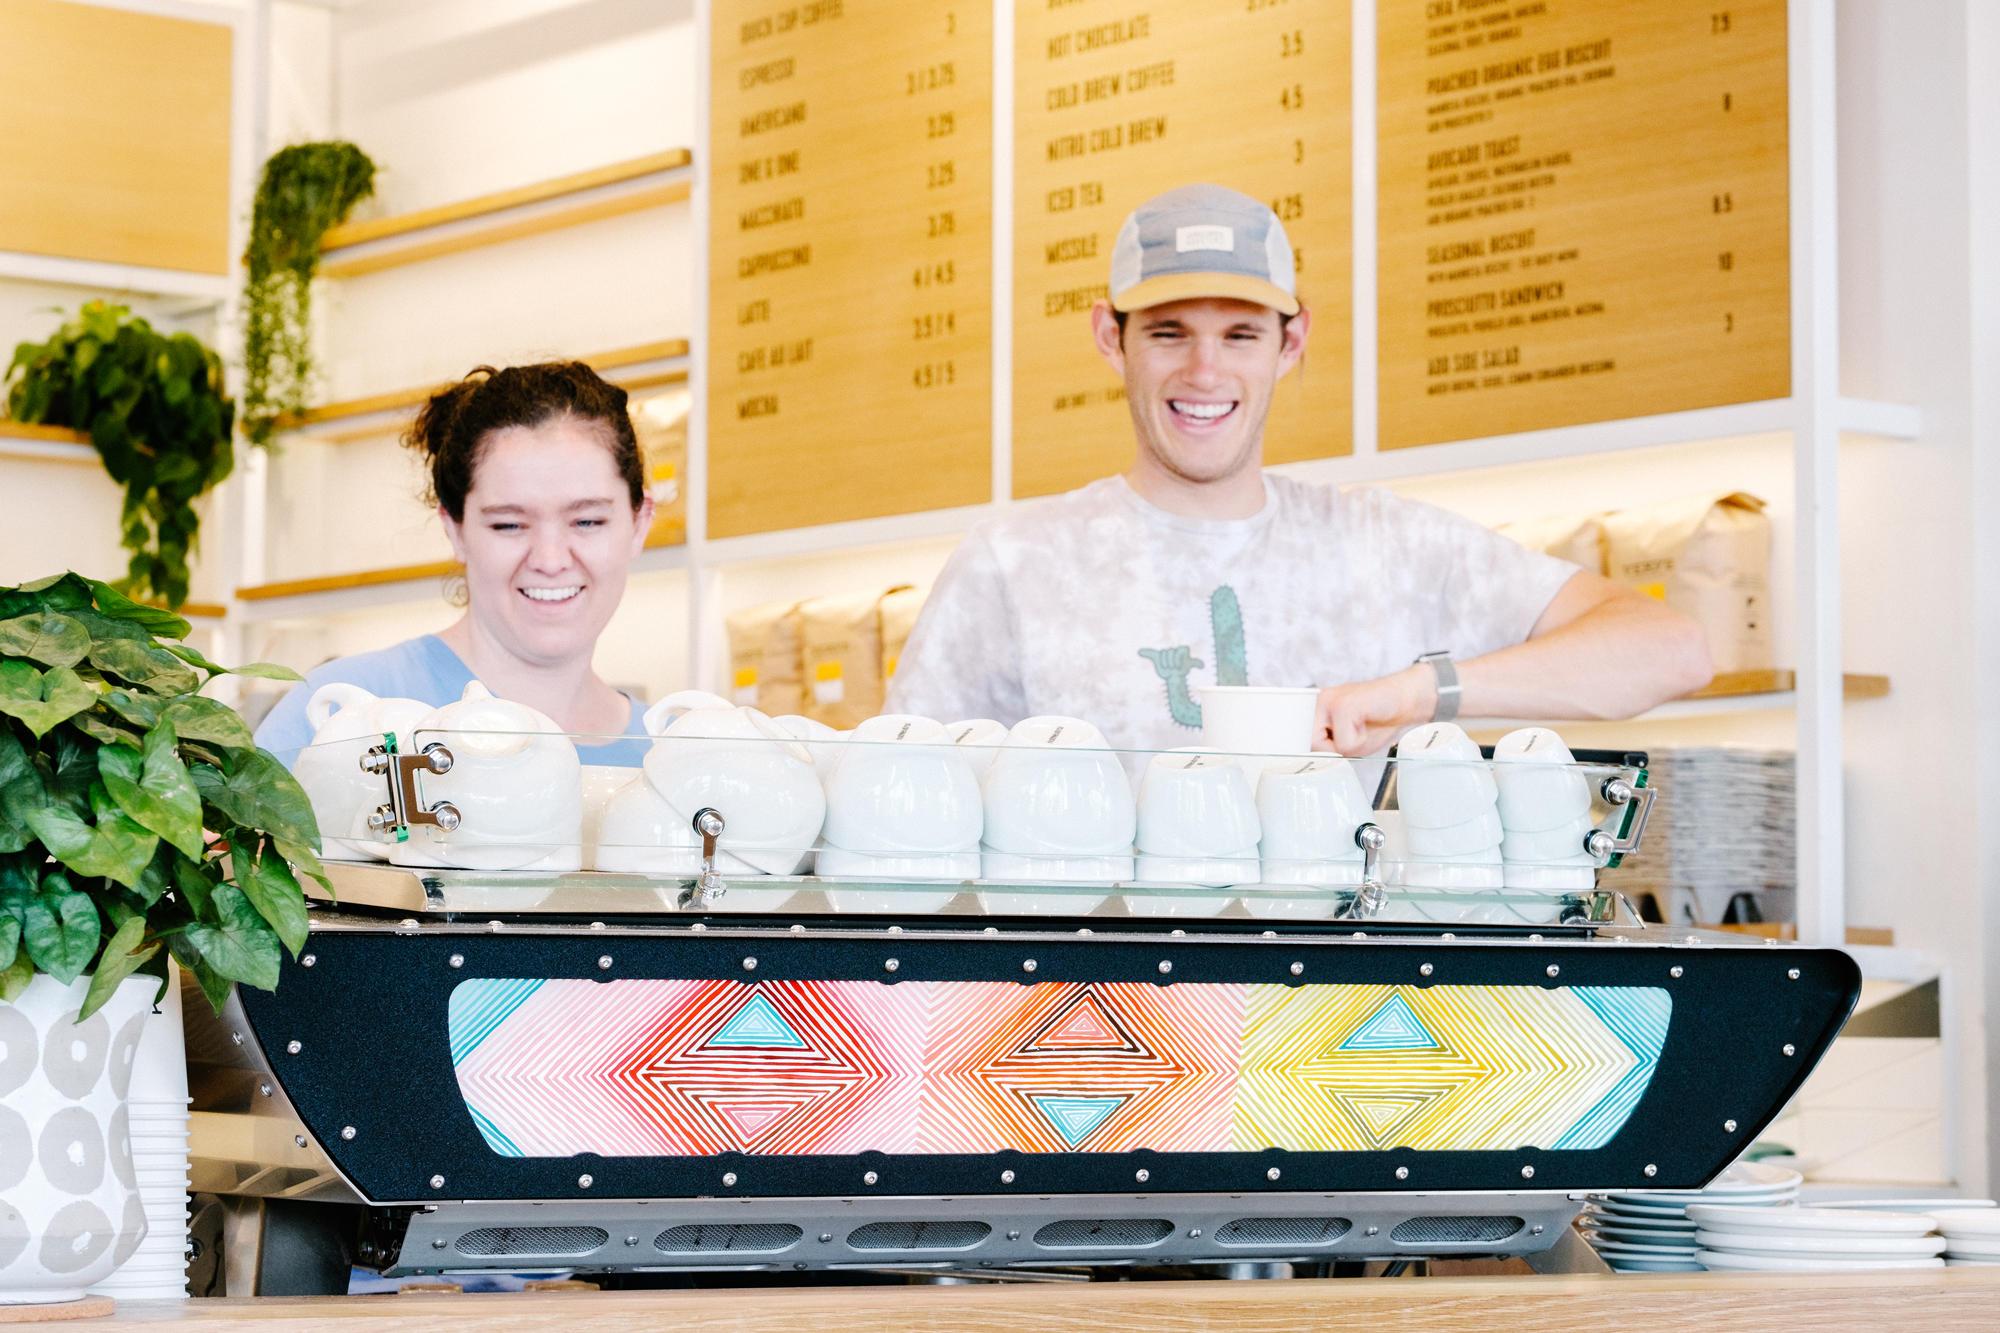 Verve Coffee Roasters in Santa Cruz, CA, photo #4